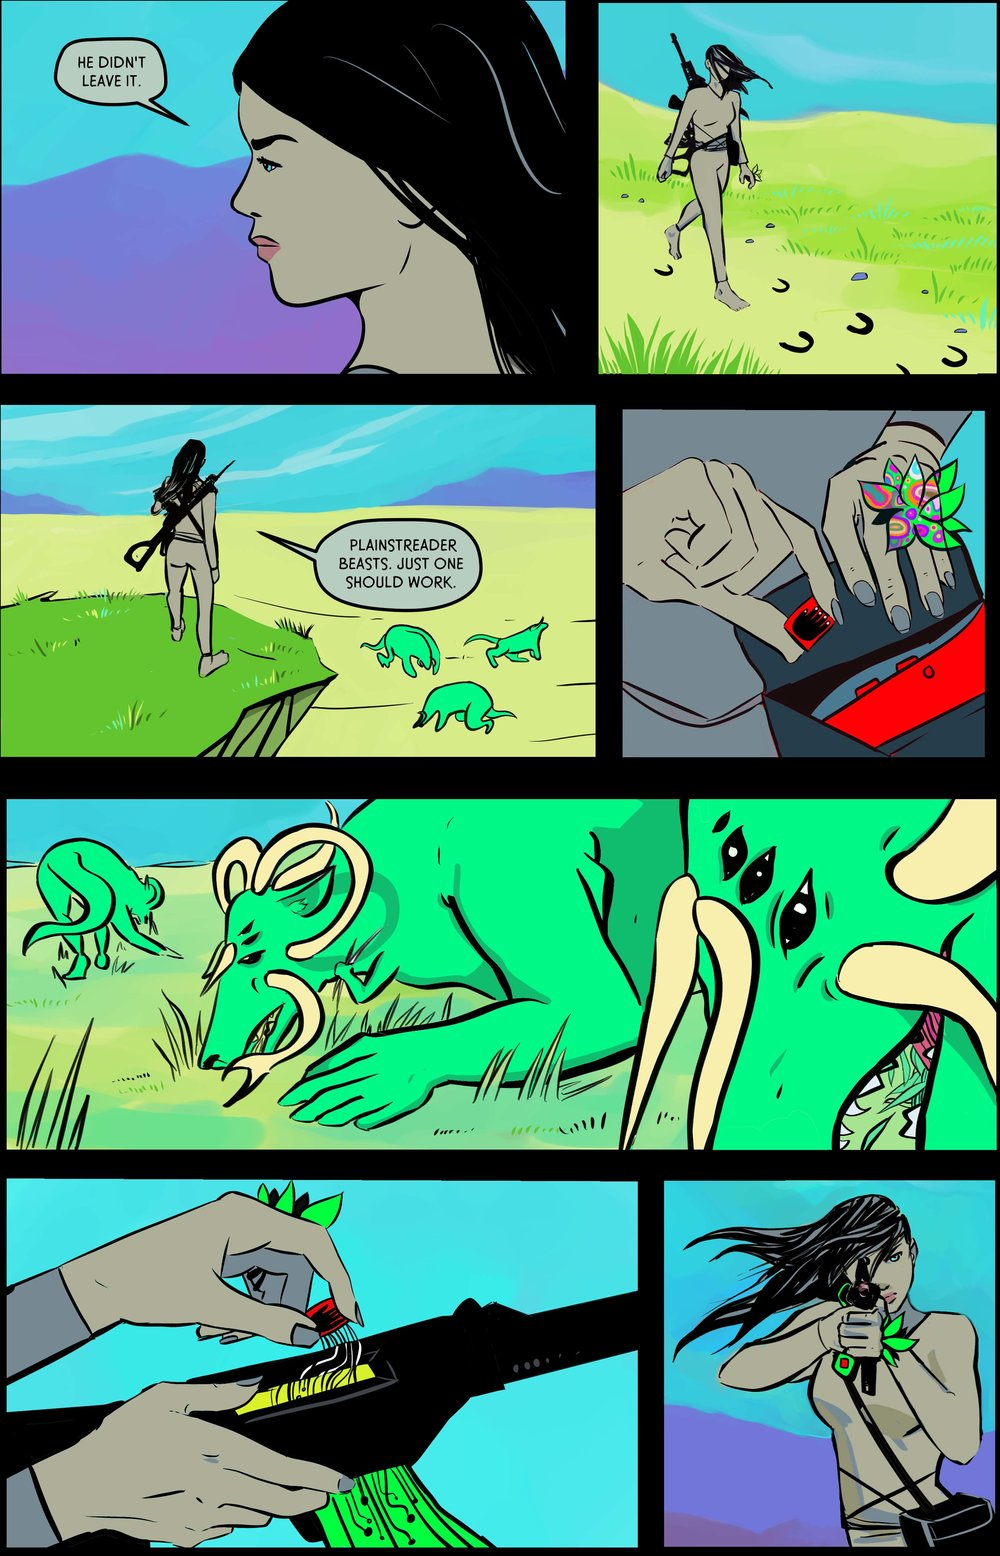 The Gray Woman Tilted Sun Plainstreader Beasts.jpg